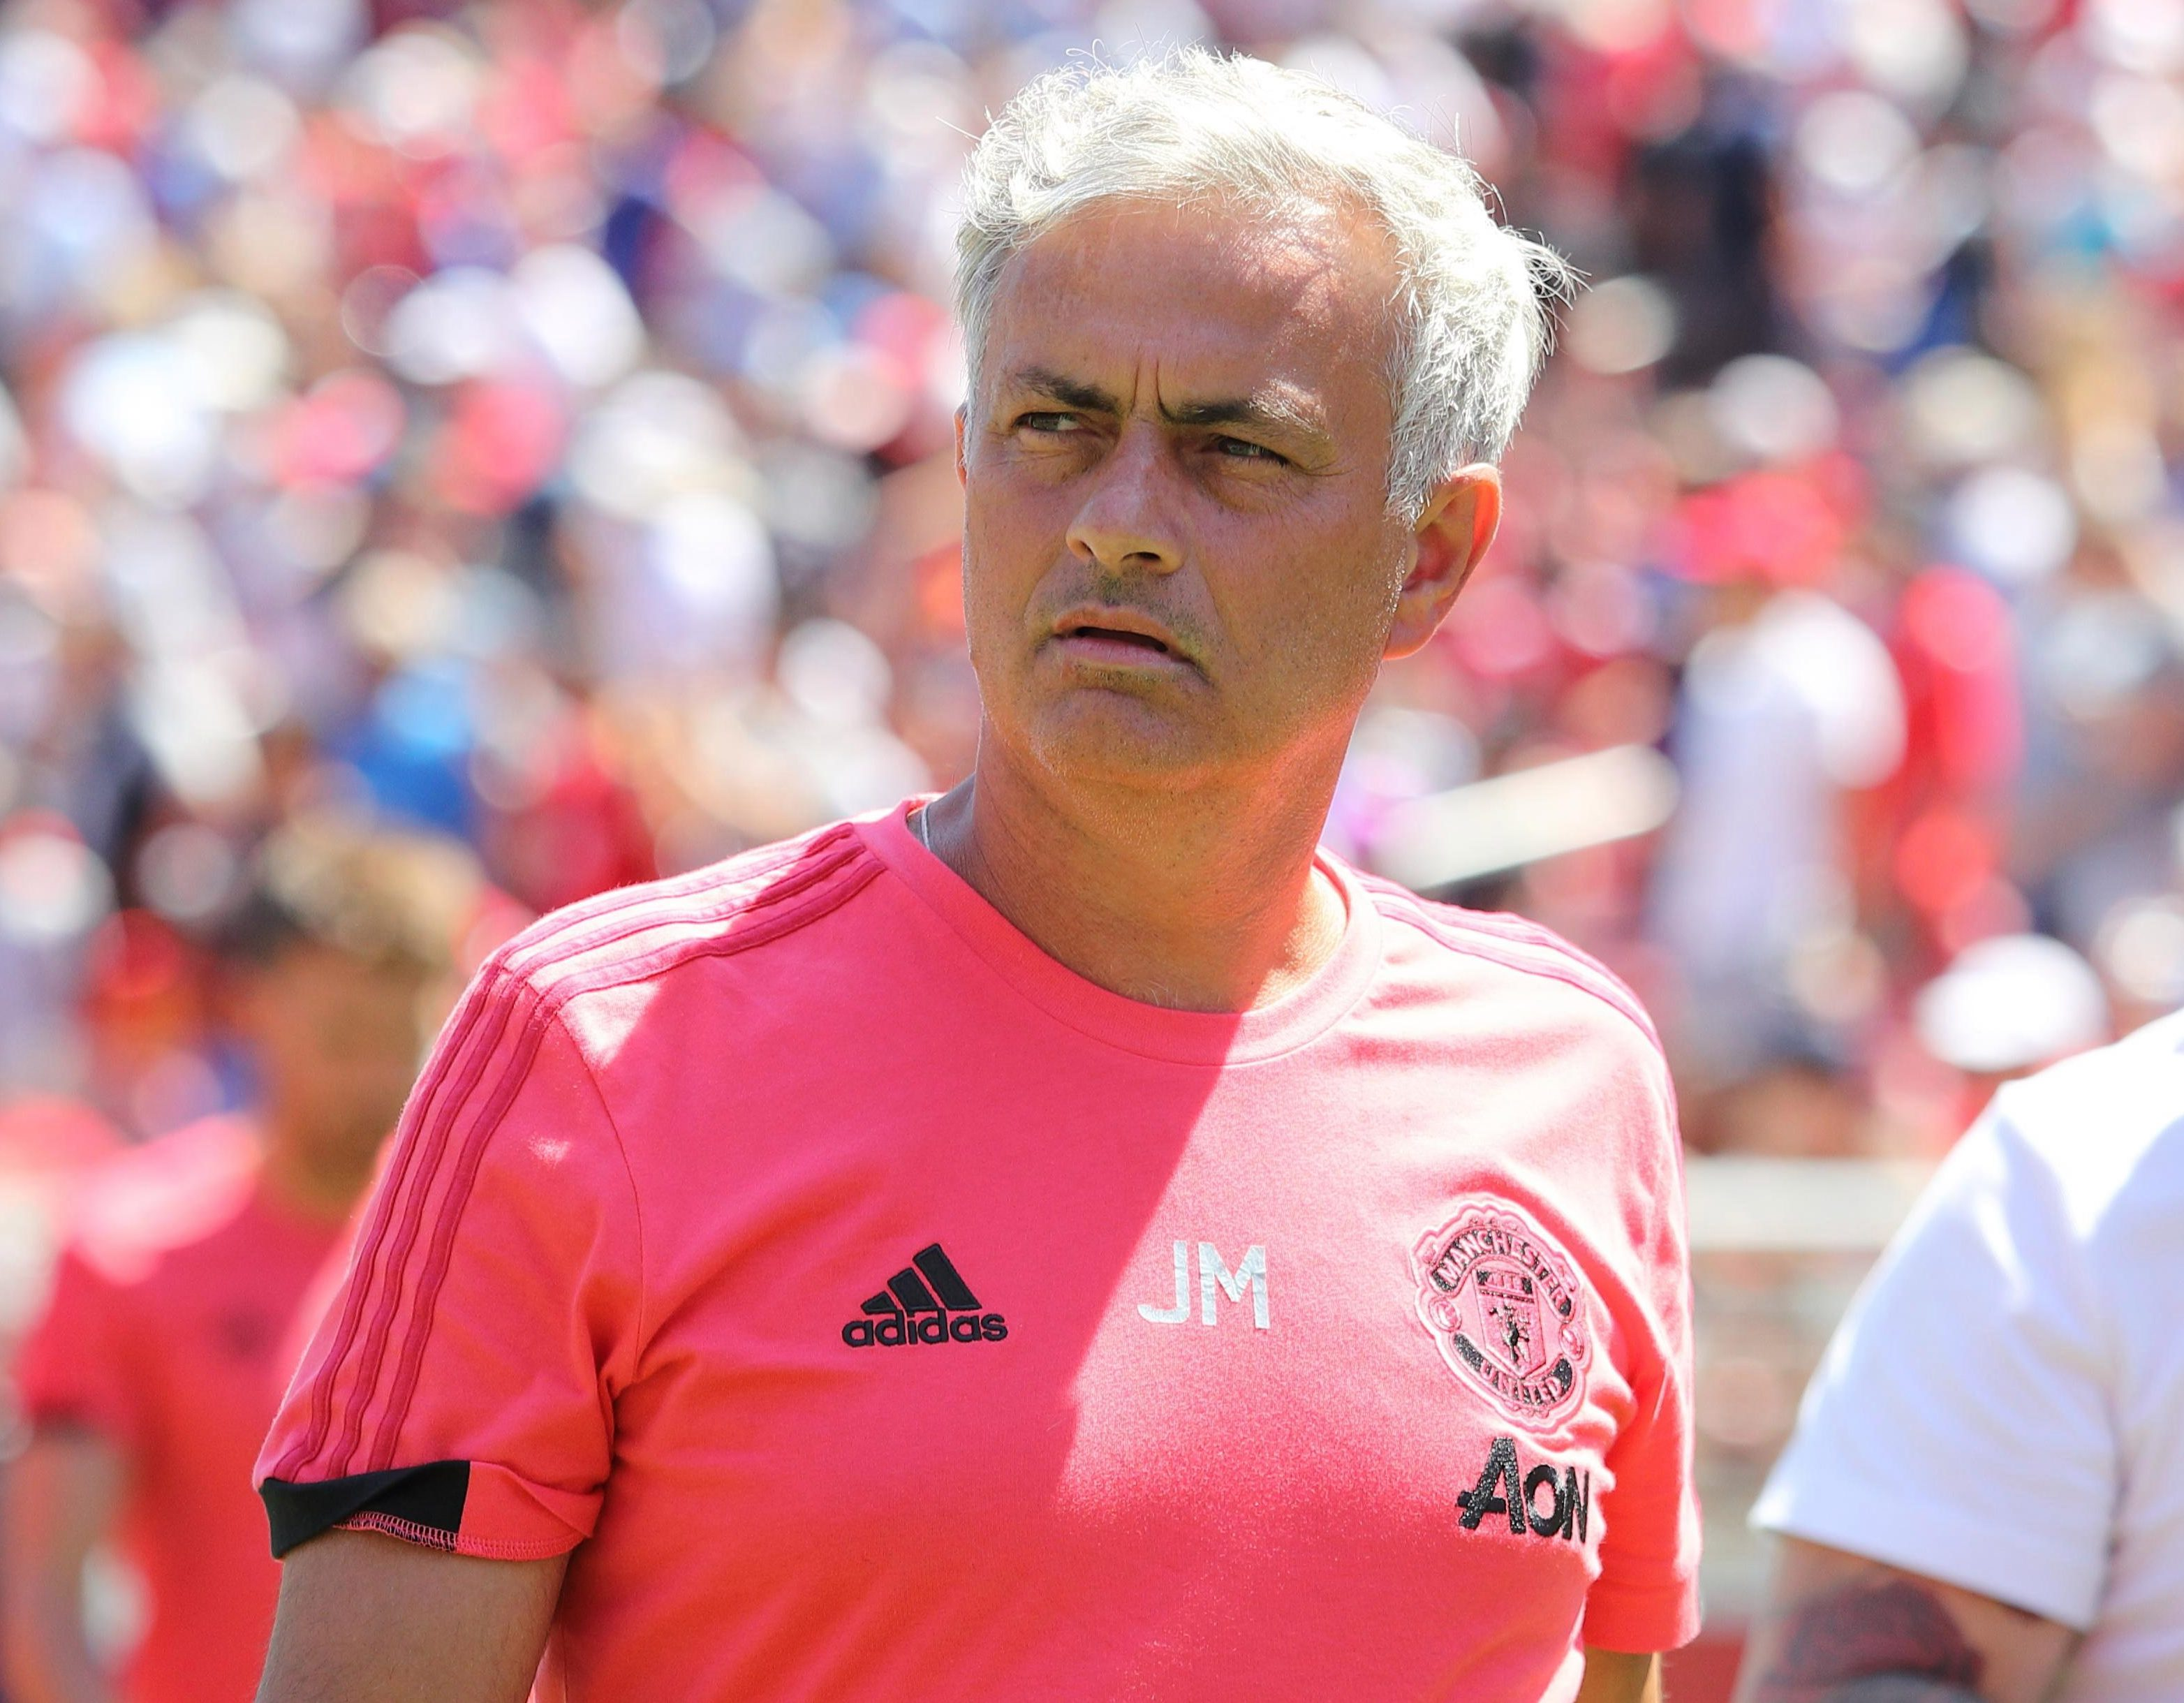 Jose Mourinho's side finished second in the Premier League last season